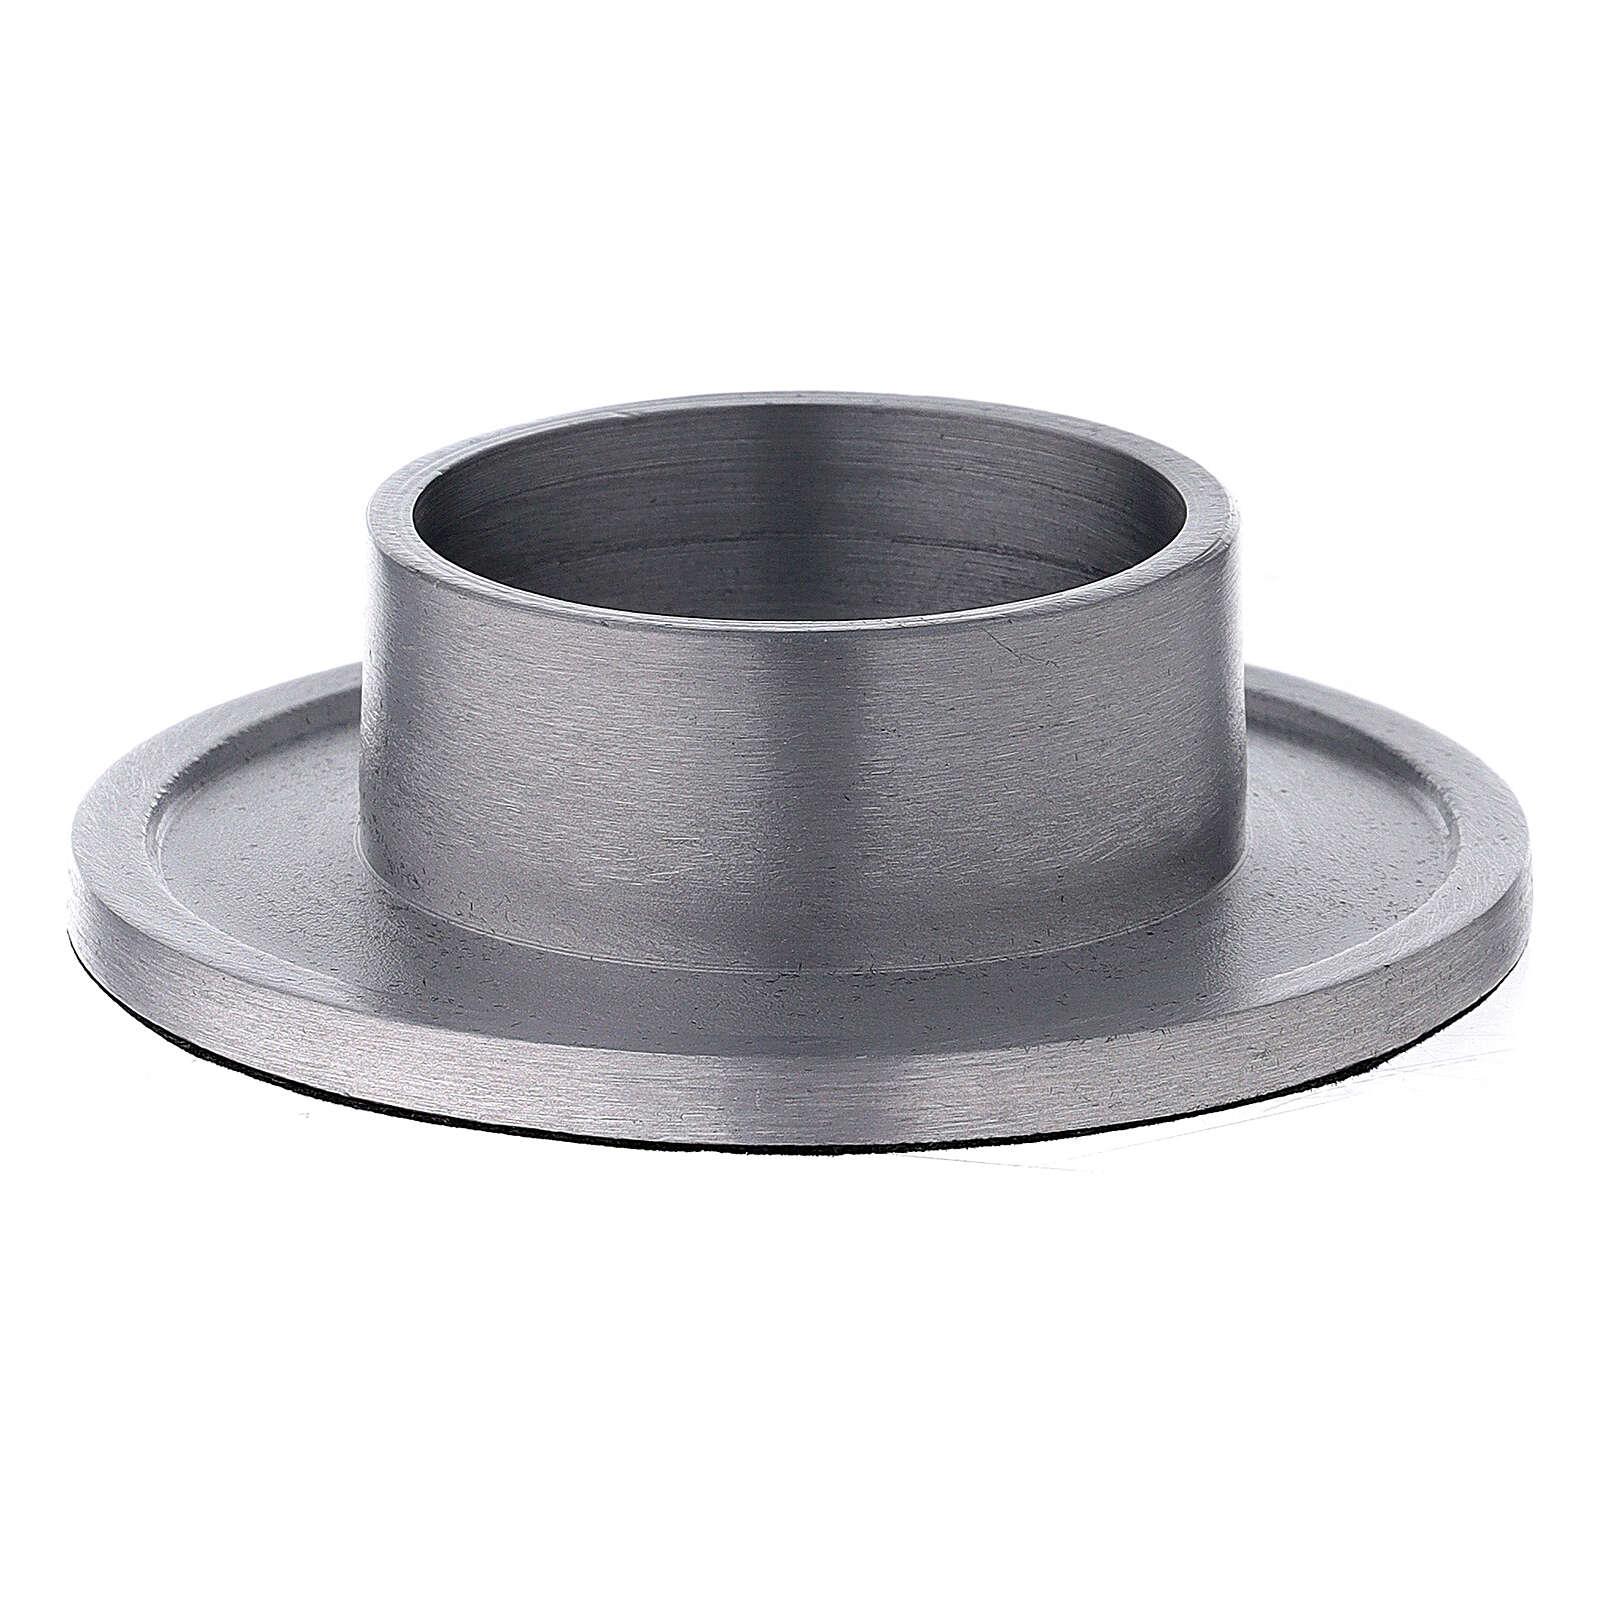 Portacandela alluminio satinato rialzo 5 cm 3